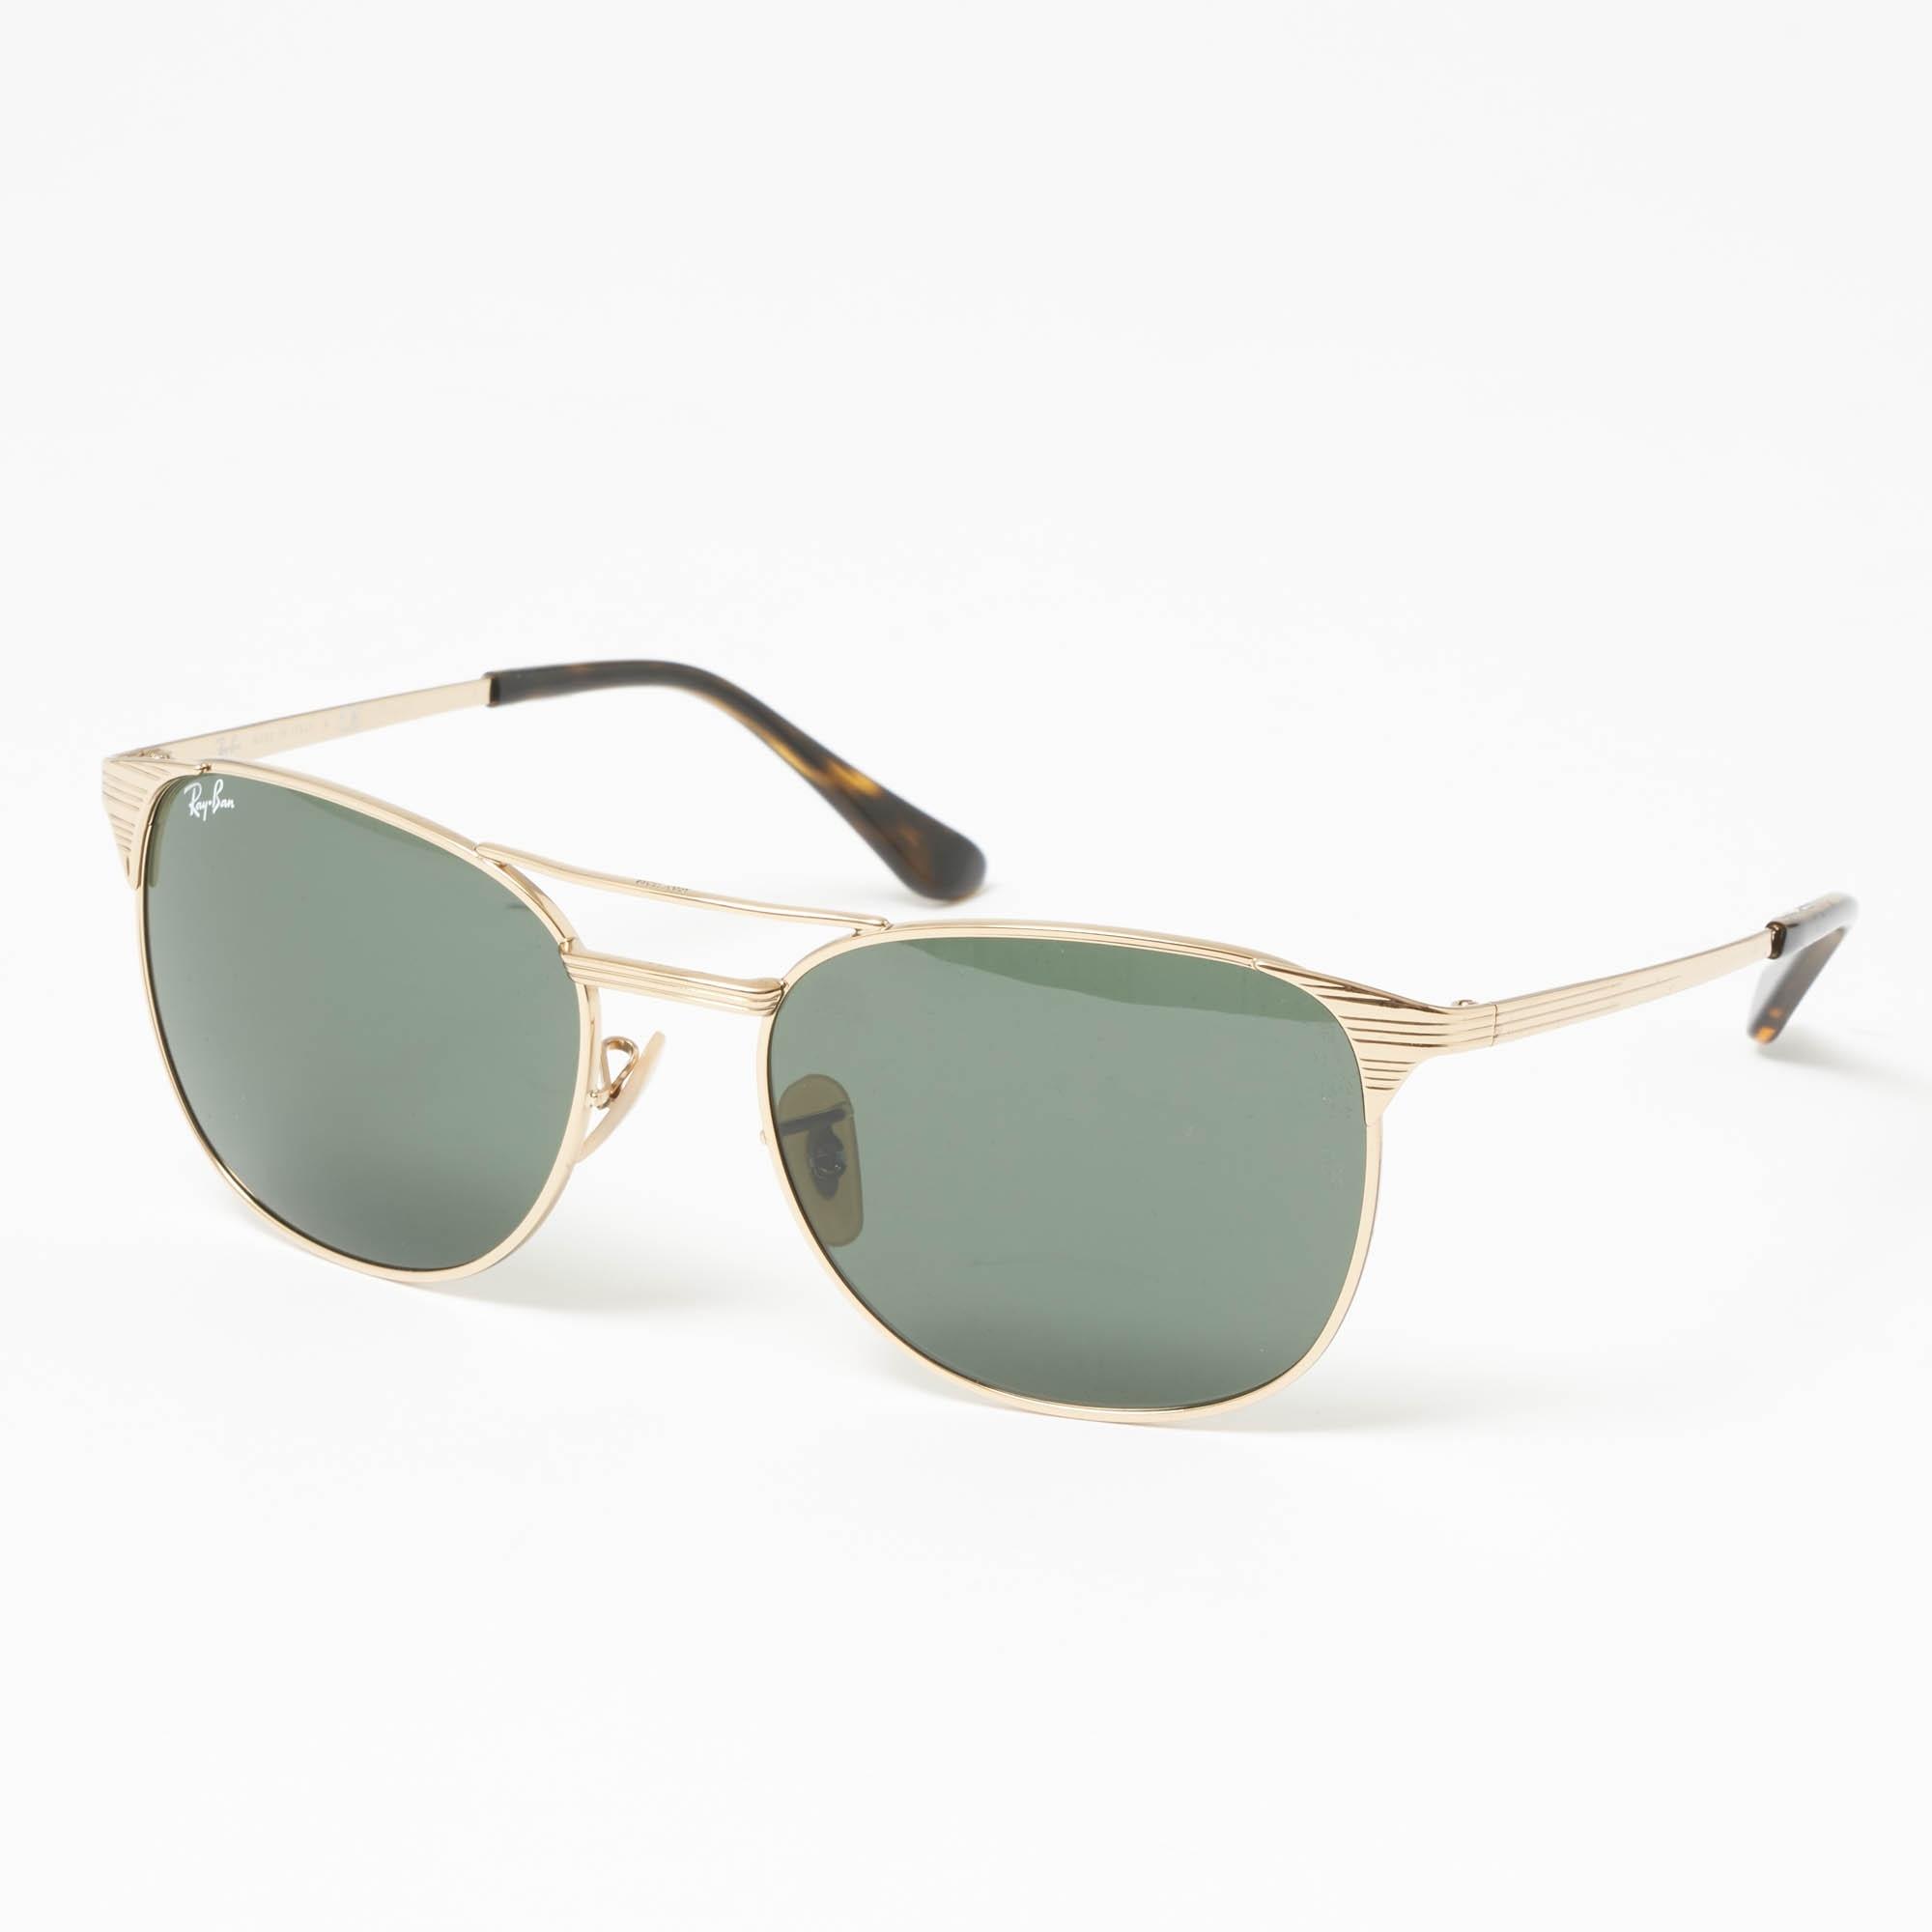 5d8ecb54b86 Gold Signet Sunglasses - Green Classic G-15 Lenses